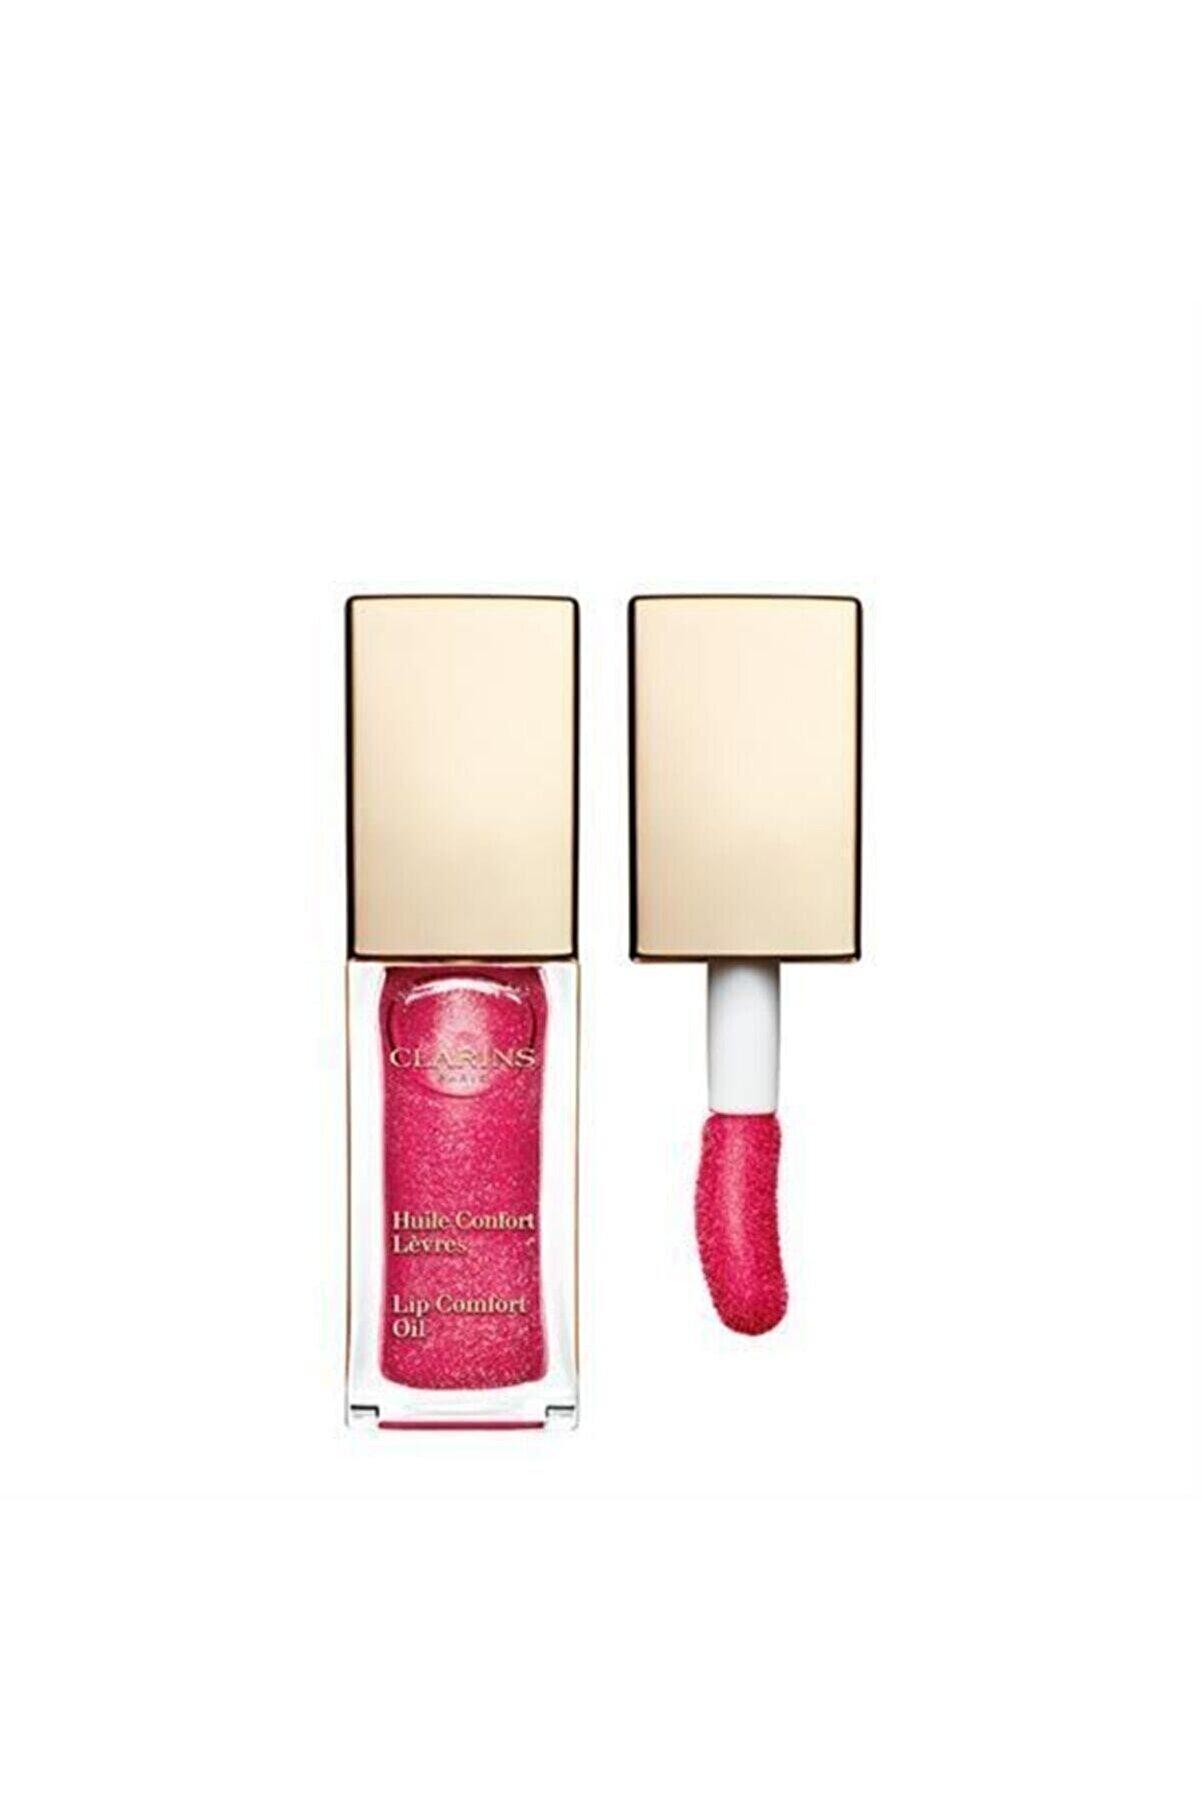 Clarins Lip Comfort Oil 12 Candy Glam Dudak Yağı